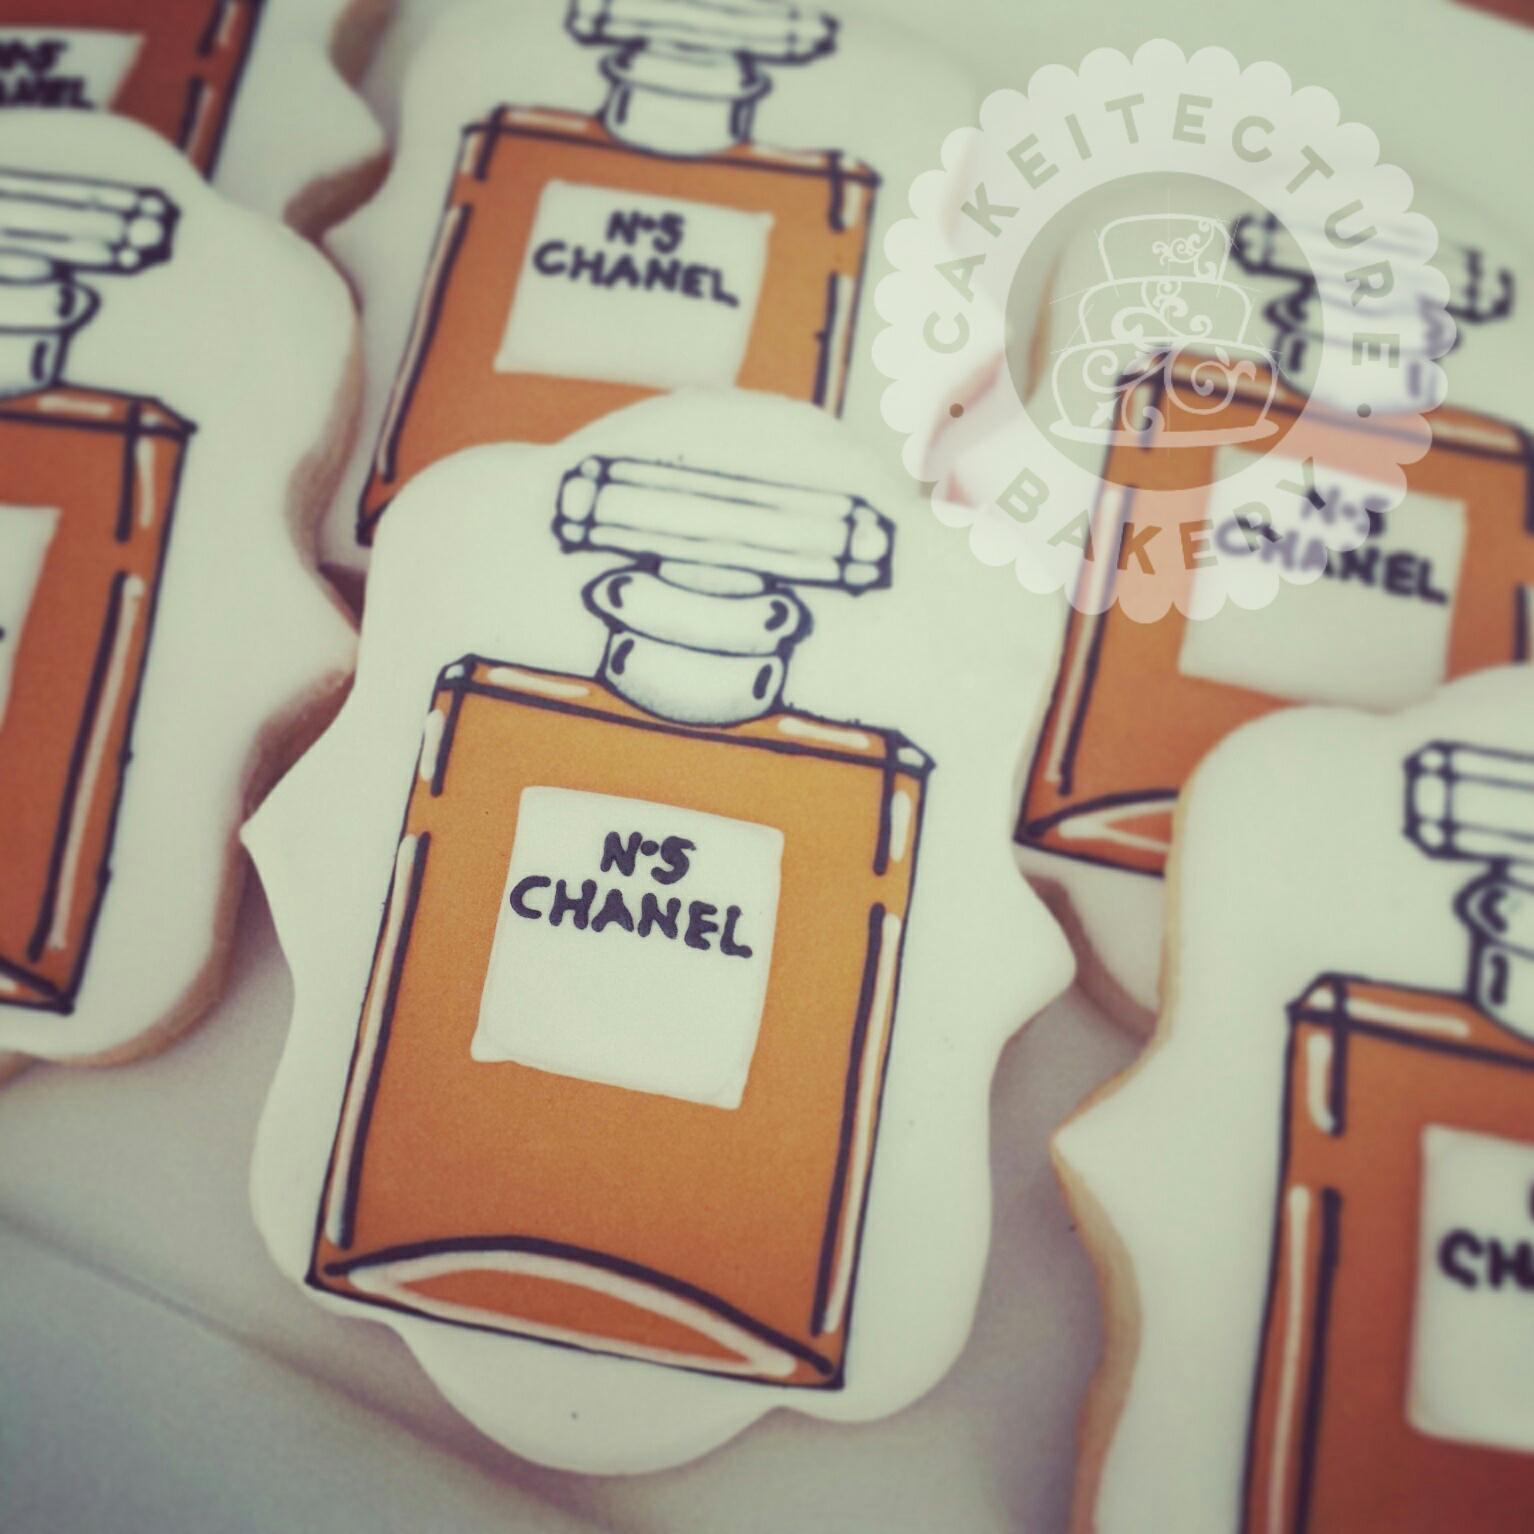 Cakeitecture Bakery chanel cookies.jpg